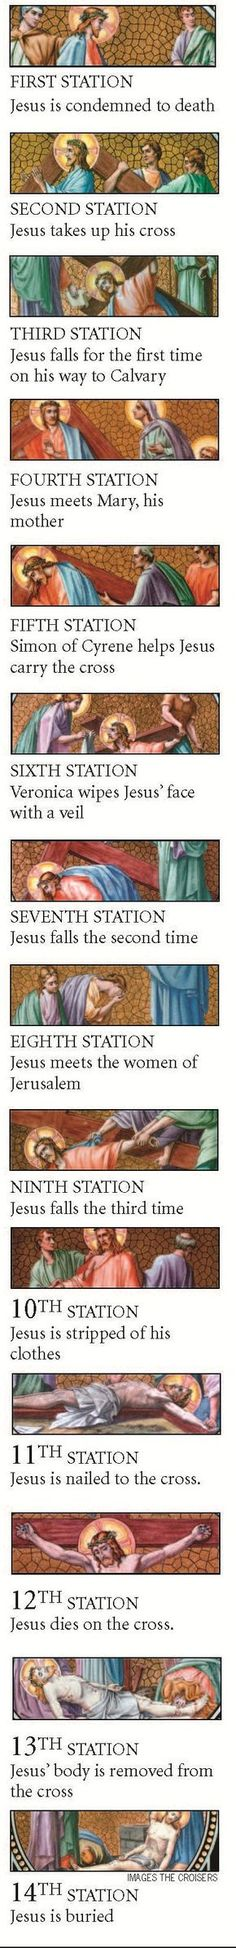 Via Dolorosa: The Stations of the Cross